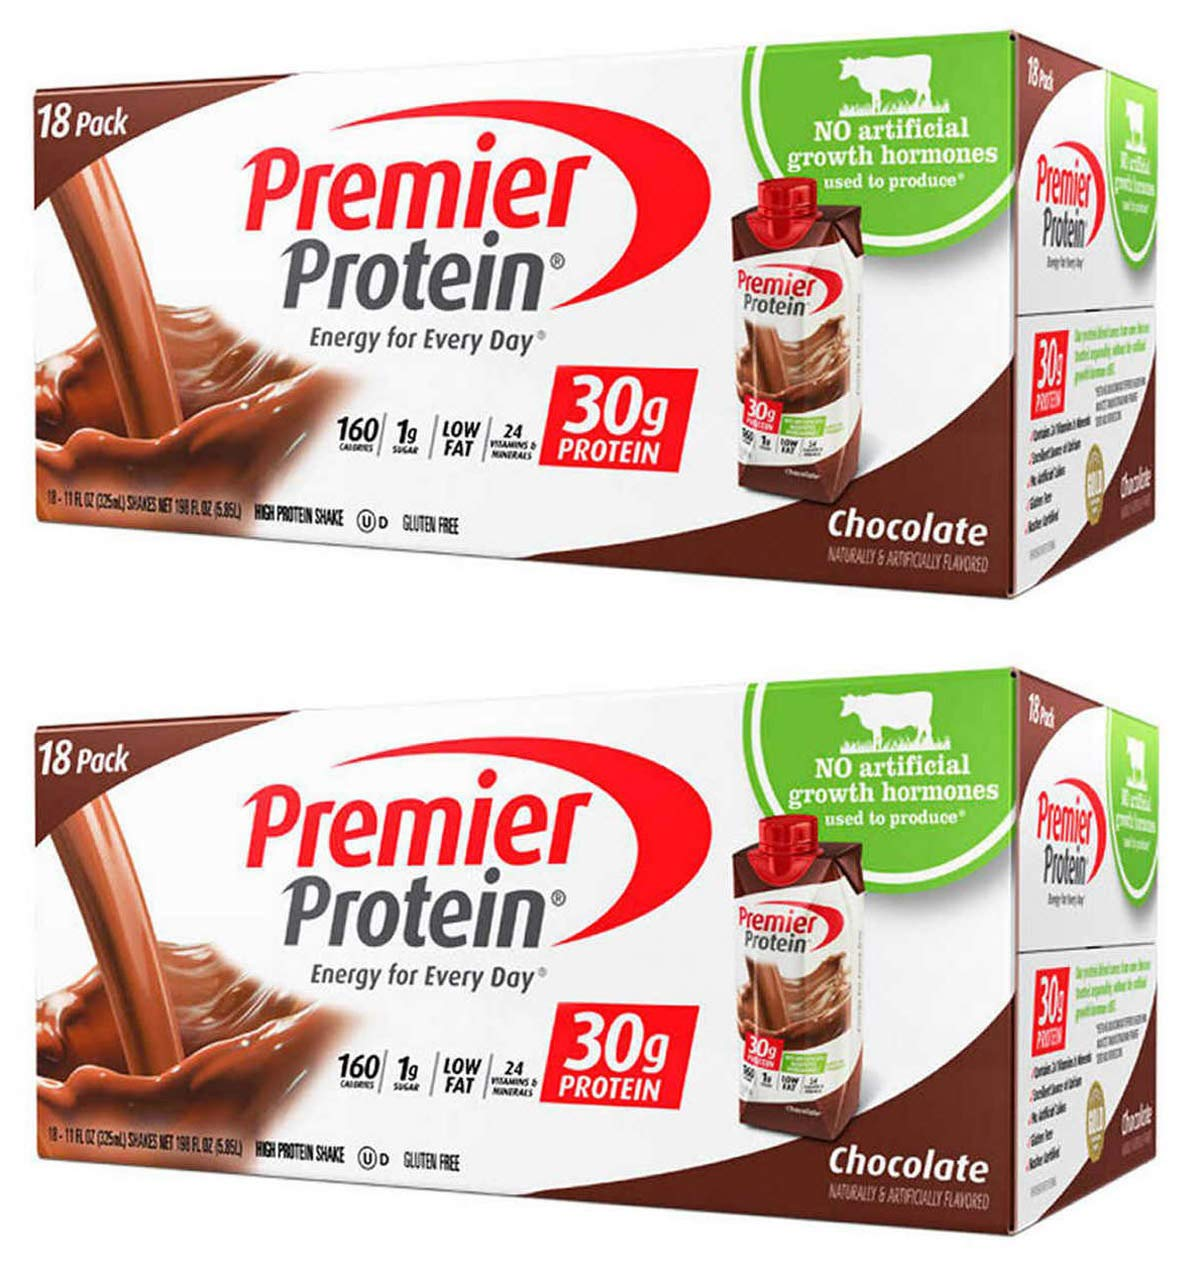 IUYEHDUH Nutrition High Protein Shake, Chocolate, 18 Count -(11 fl.oz Each) 2 Pack